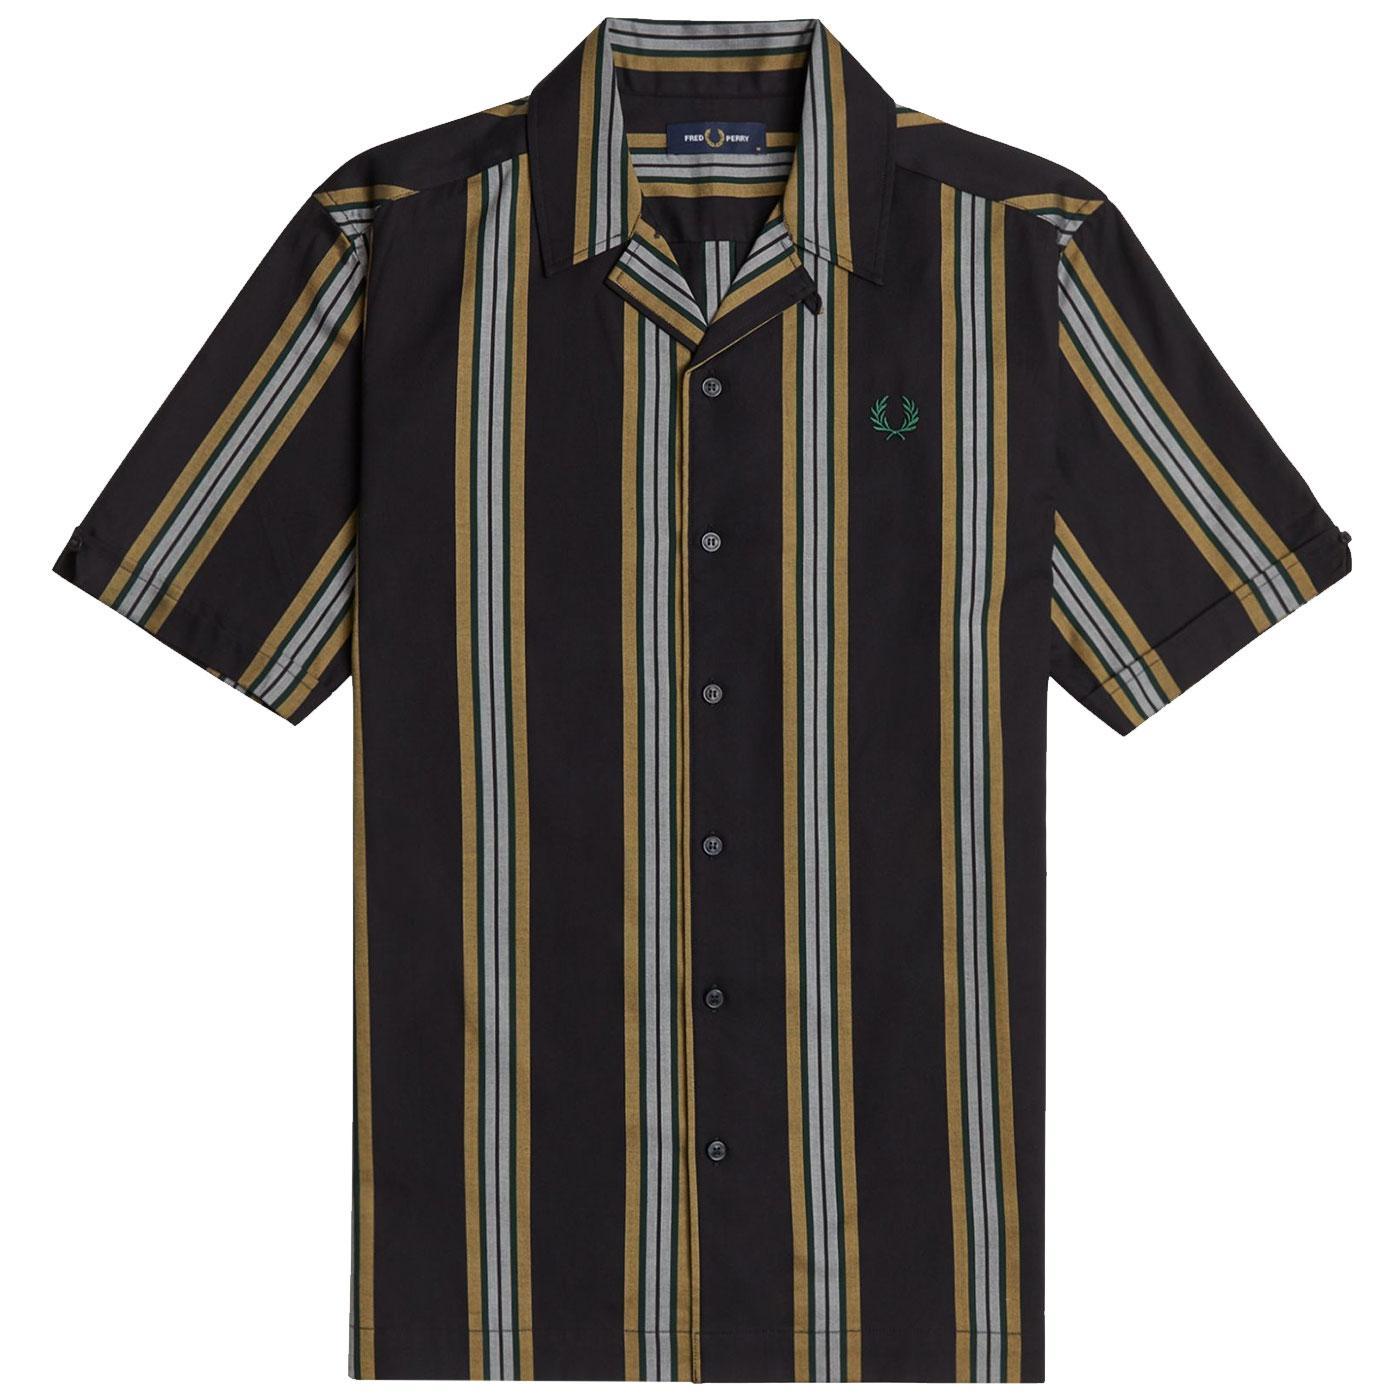 FRED PERRY Retro Stripe S/S Revere Collar Shirt